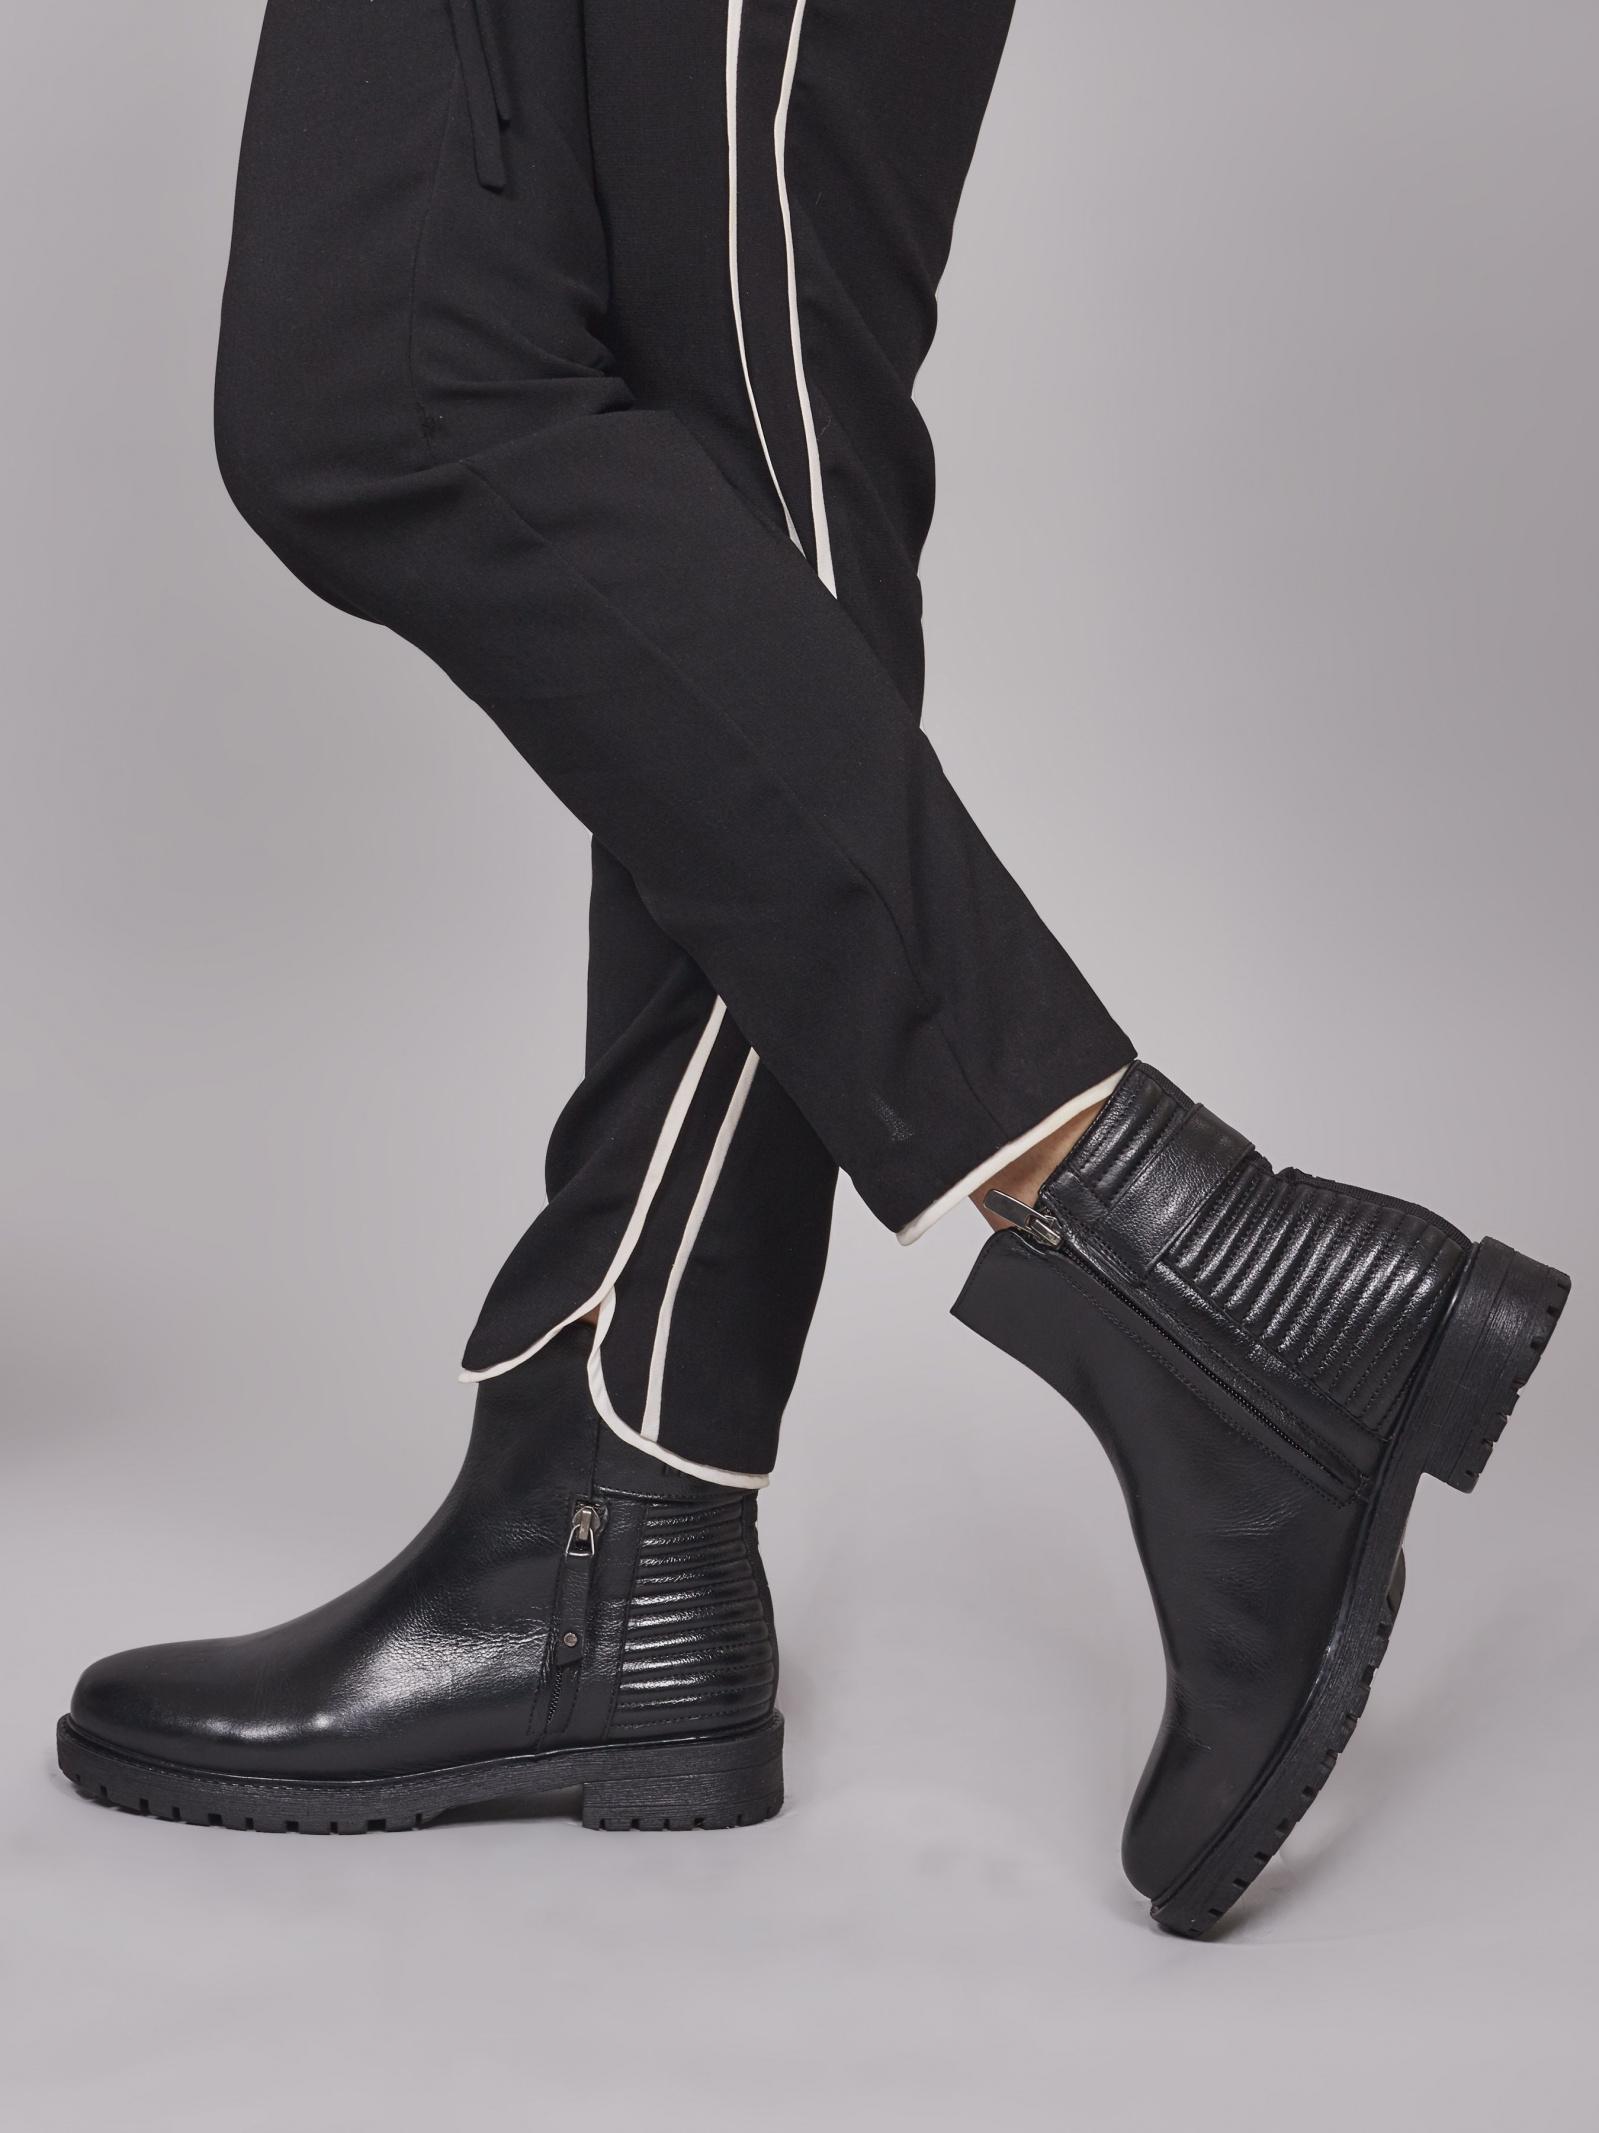 Ботинки для женщин MEXX 7L66 размерная сетка обуви, 2017